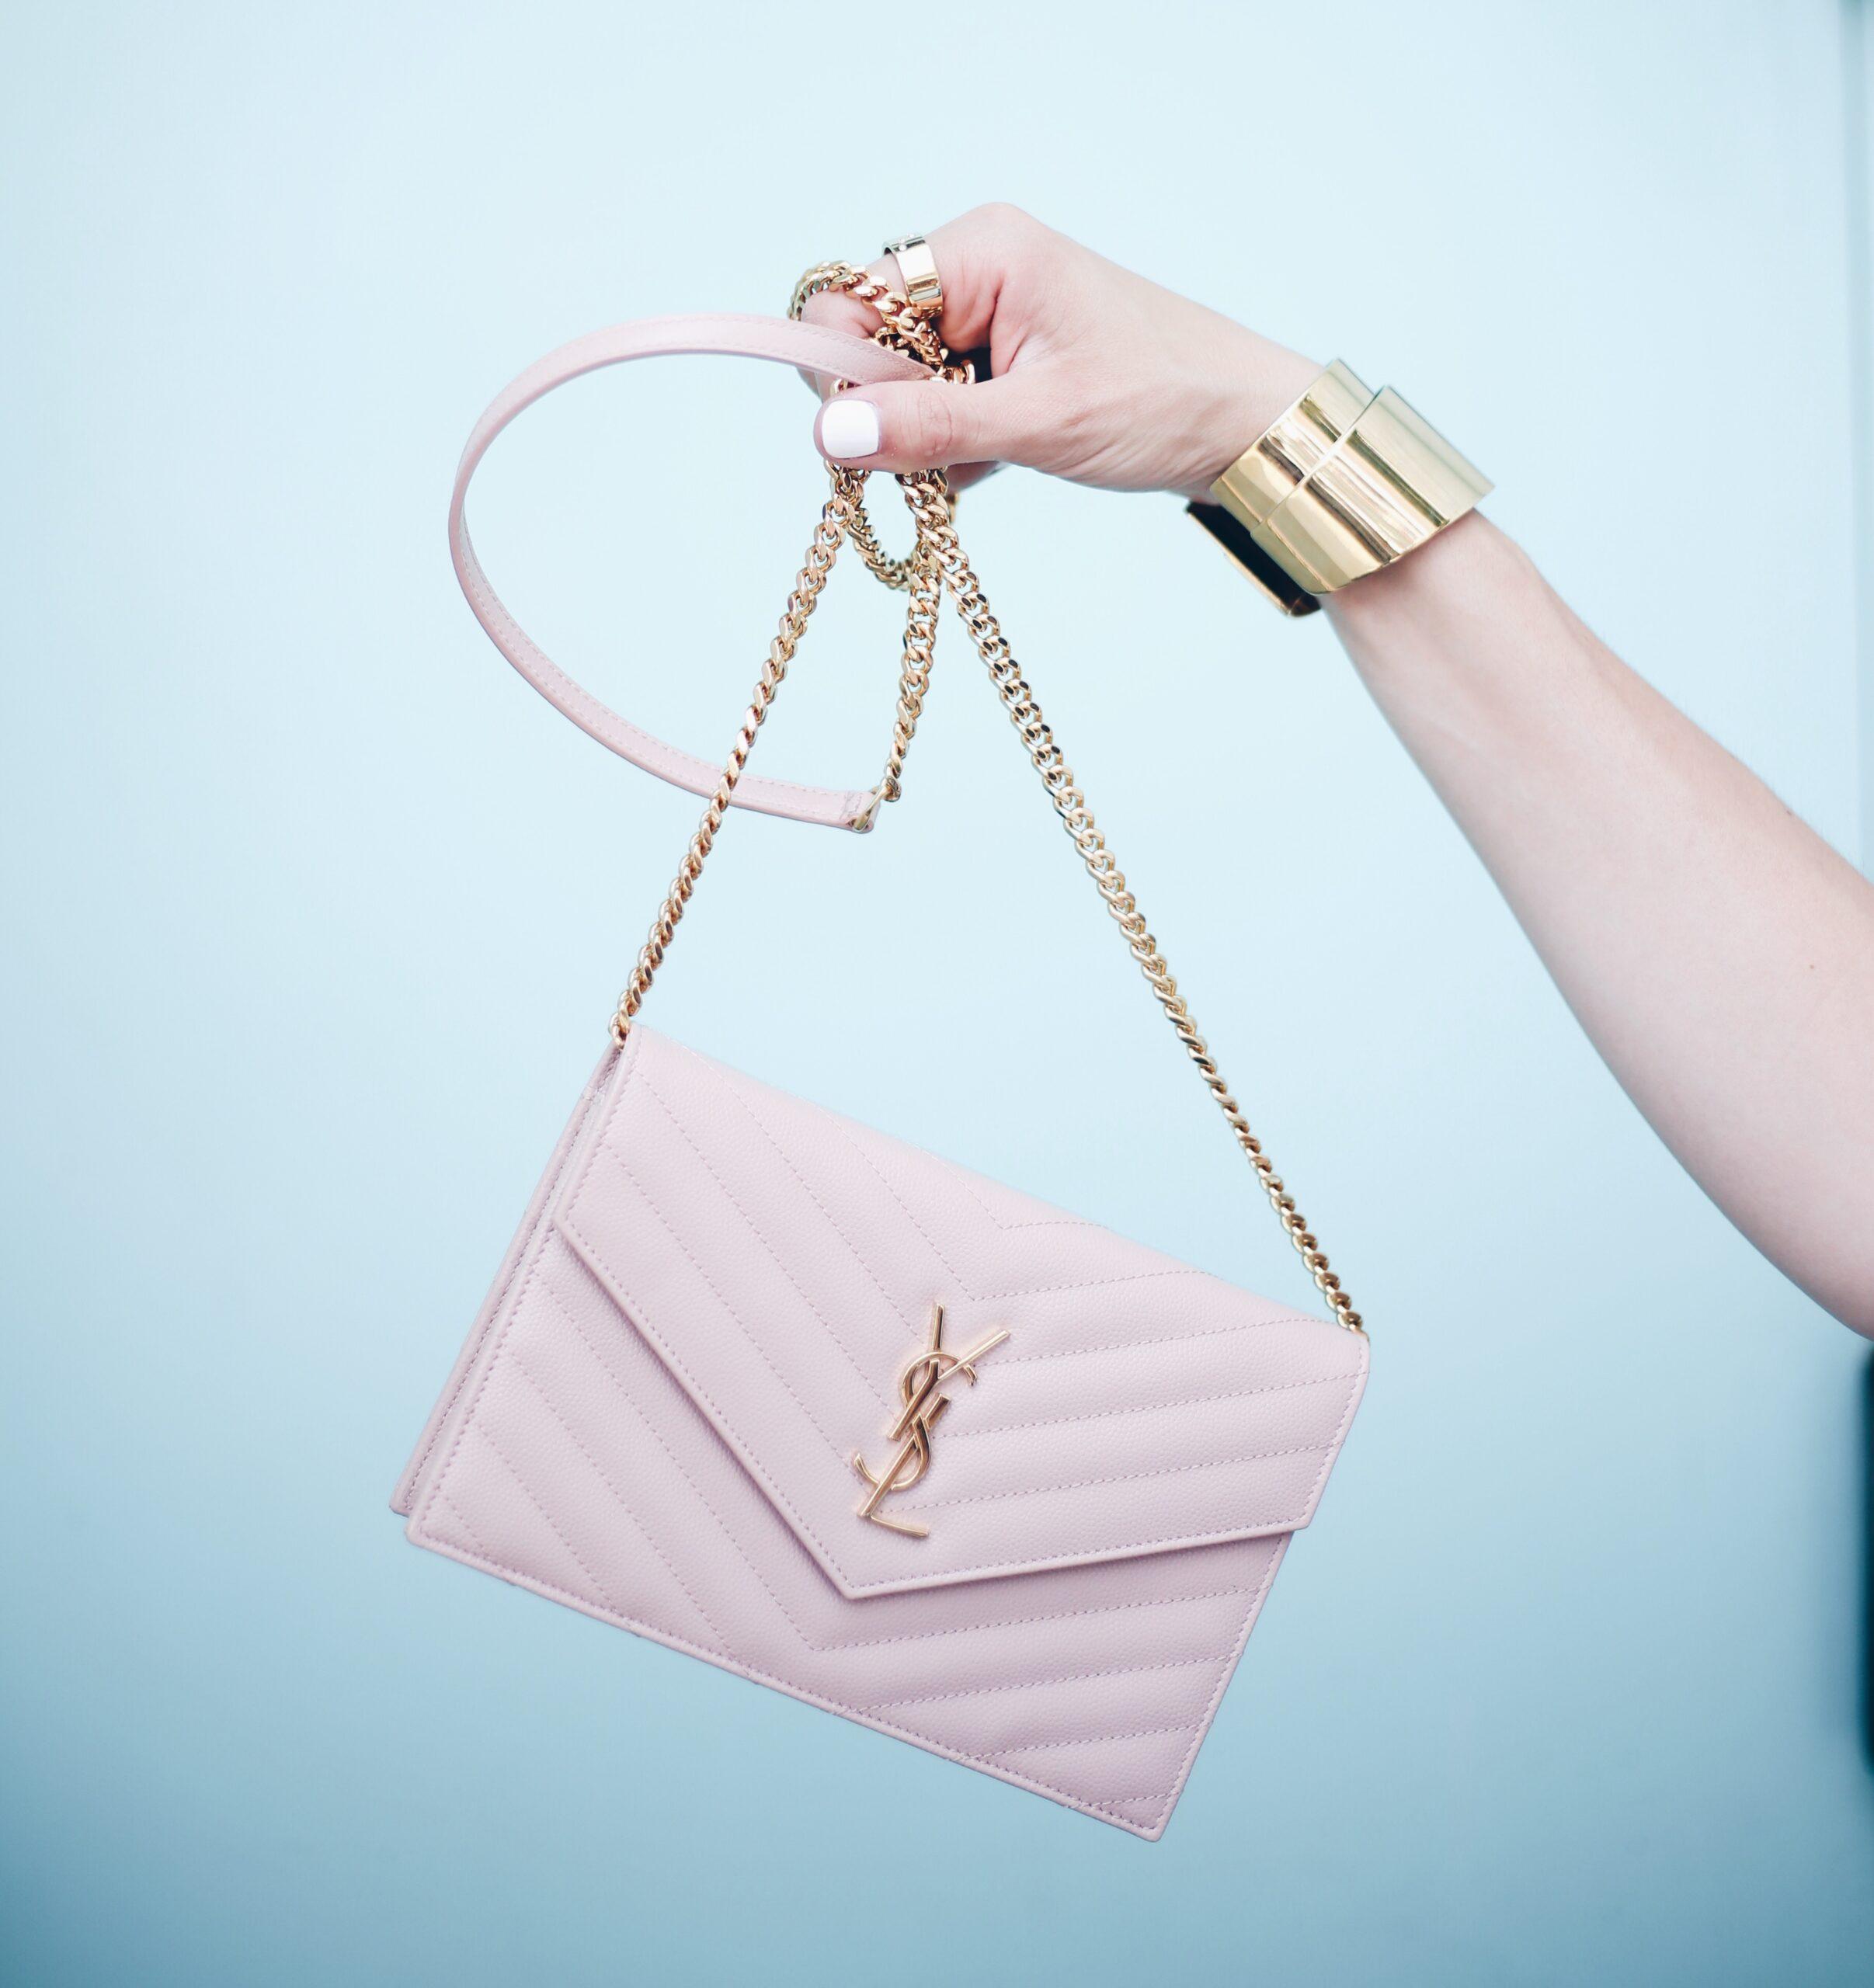 Amazing Handbag Sales